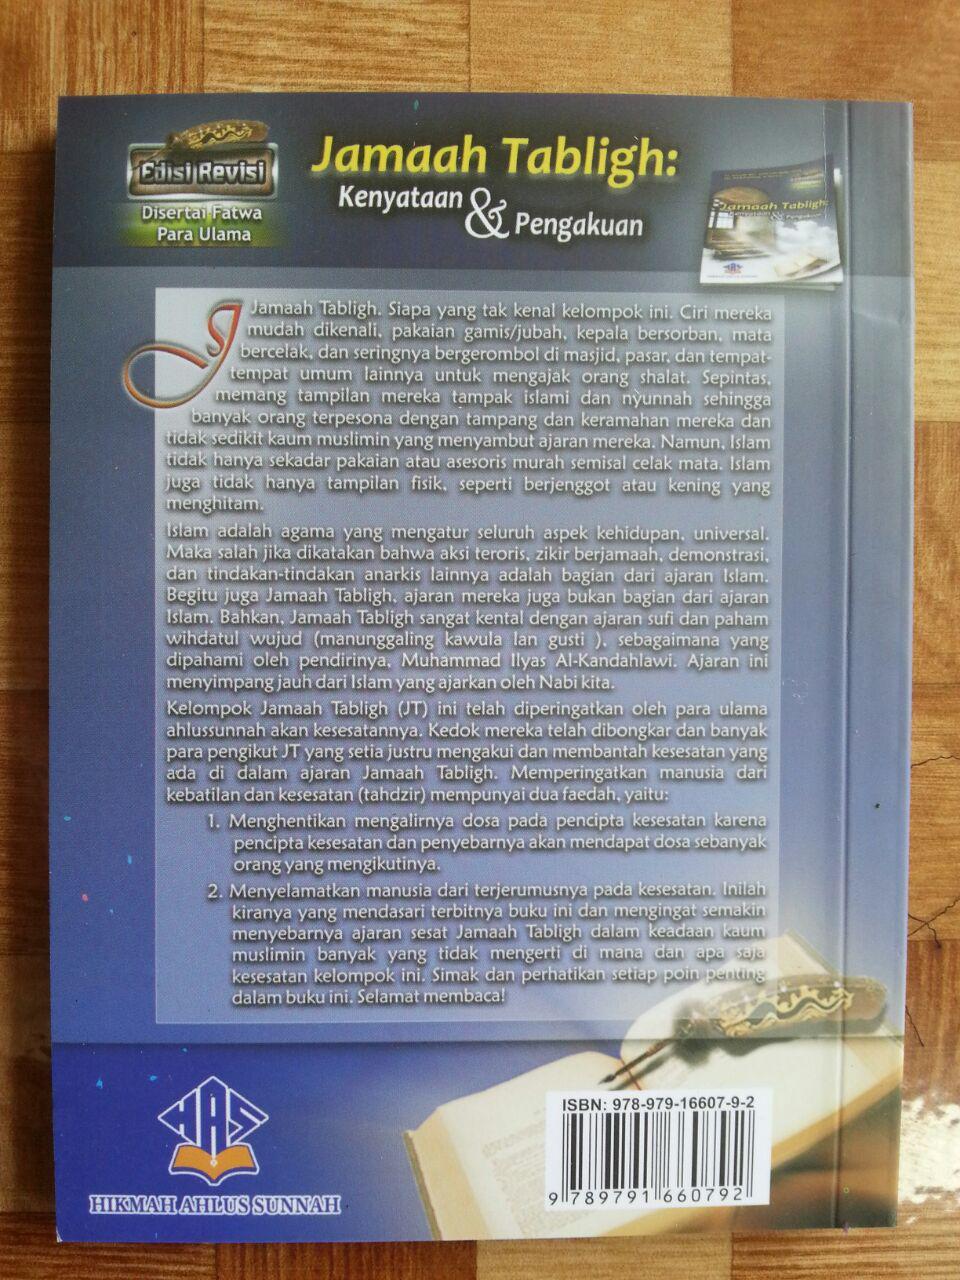 Buku Jamaah Tabligh Kenyataan Dan Pengakuan cover